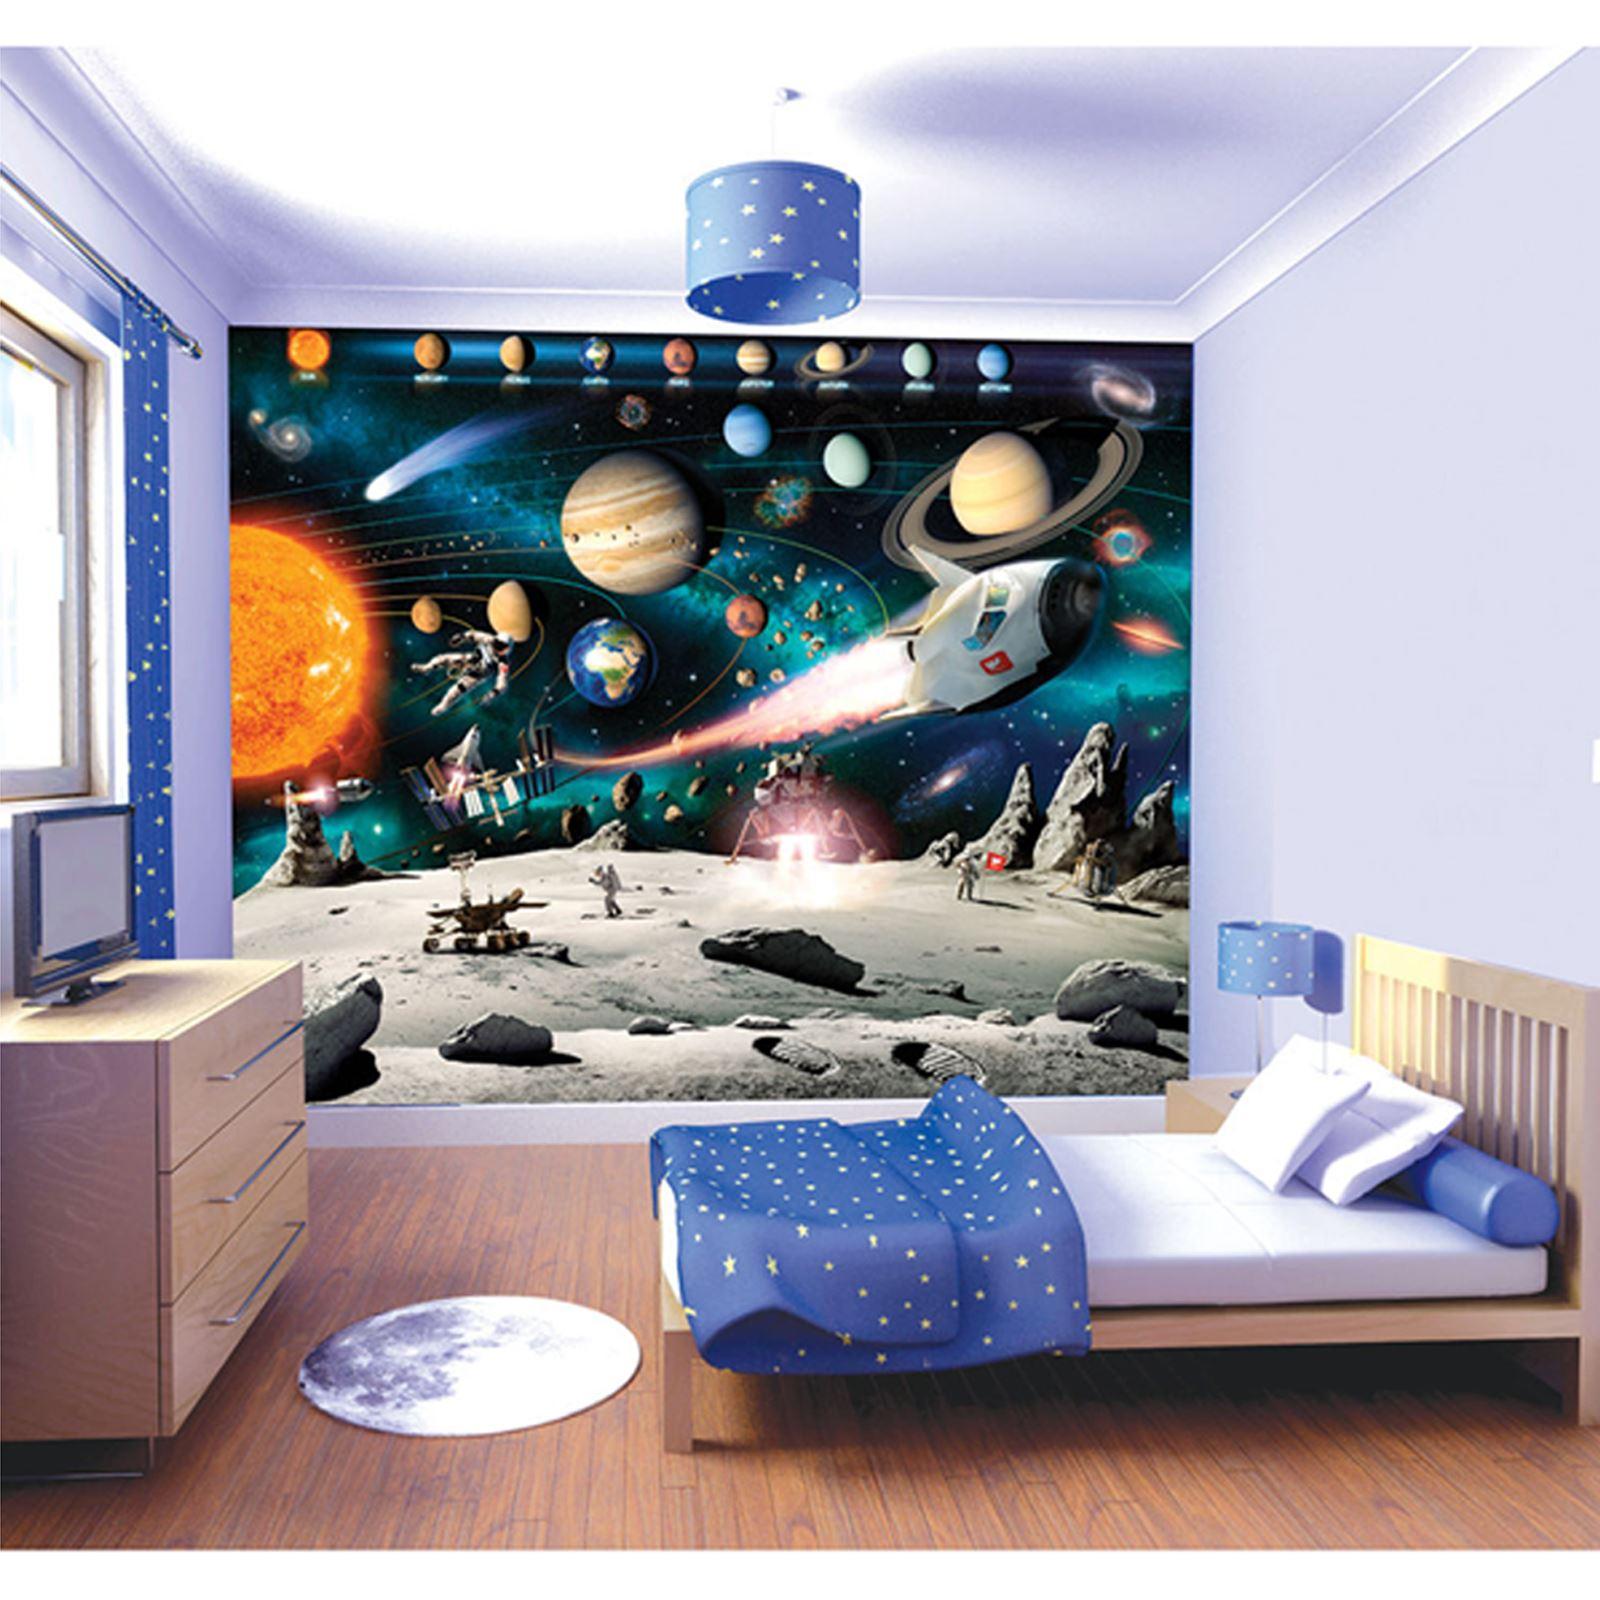 Walltastic Tapete Wandschmuck Kinder Schlafzimmer – Peppa, Avengers ...